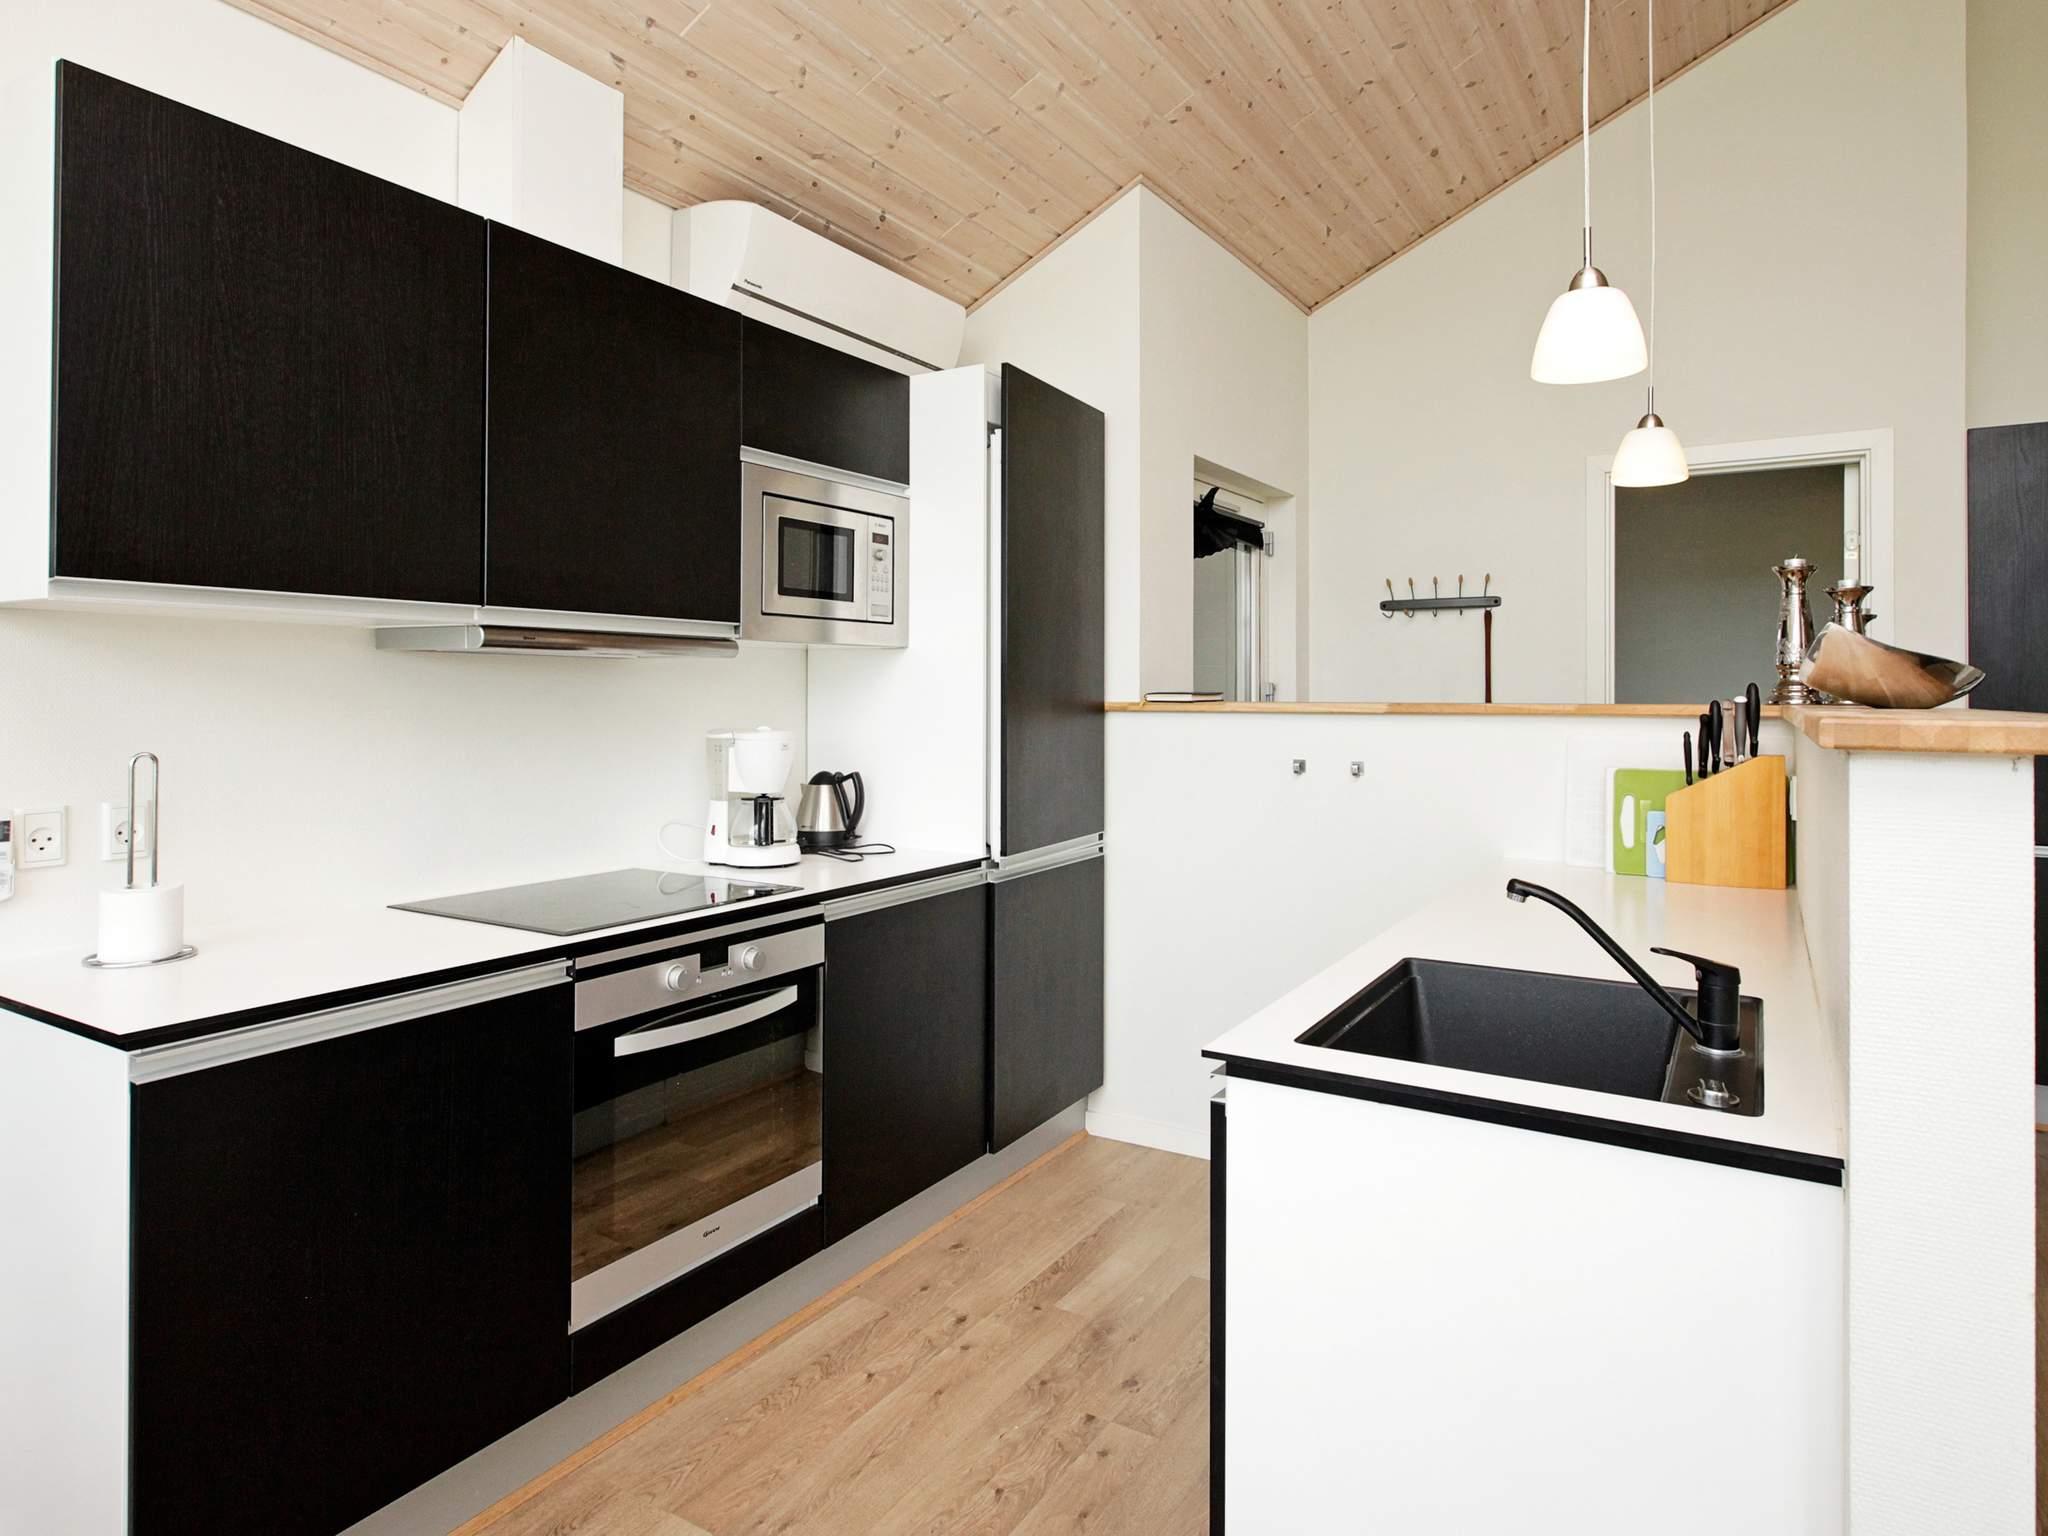 Ferienhaus Tranum Strand (379541), Tranum Enge, , Nordwestjütland, Dänemark, Bild 5